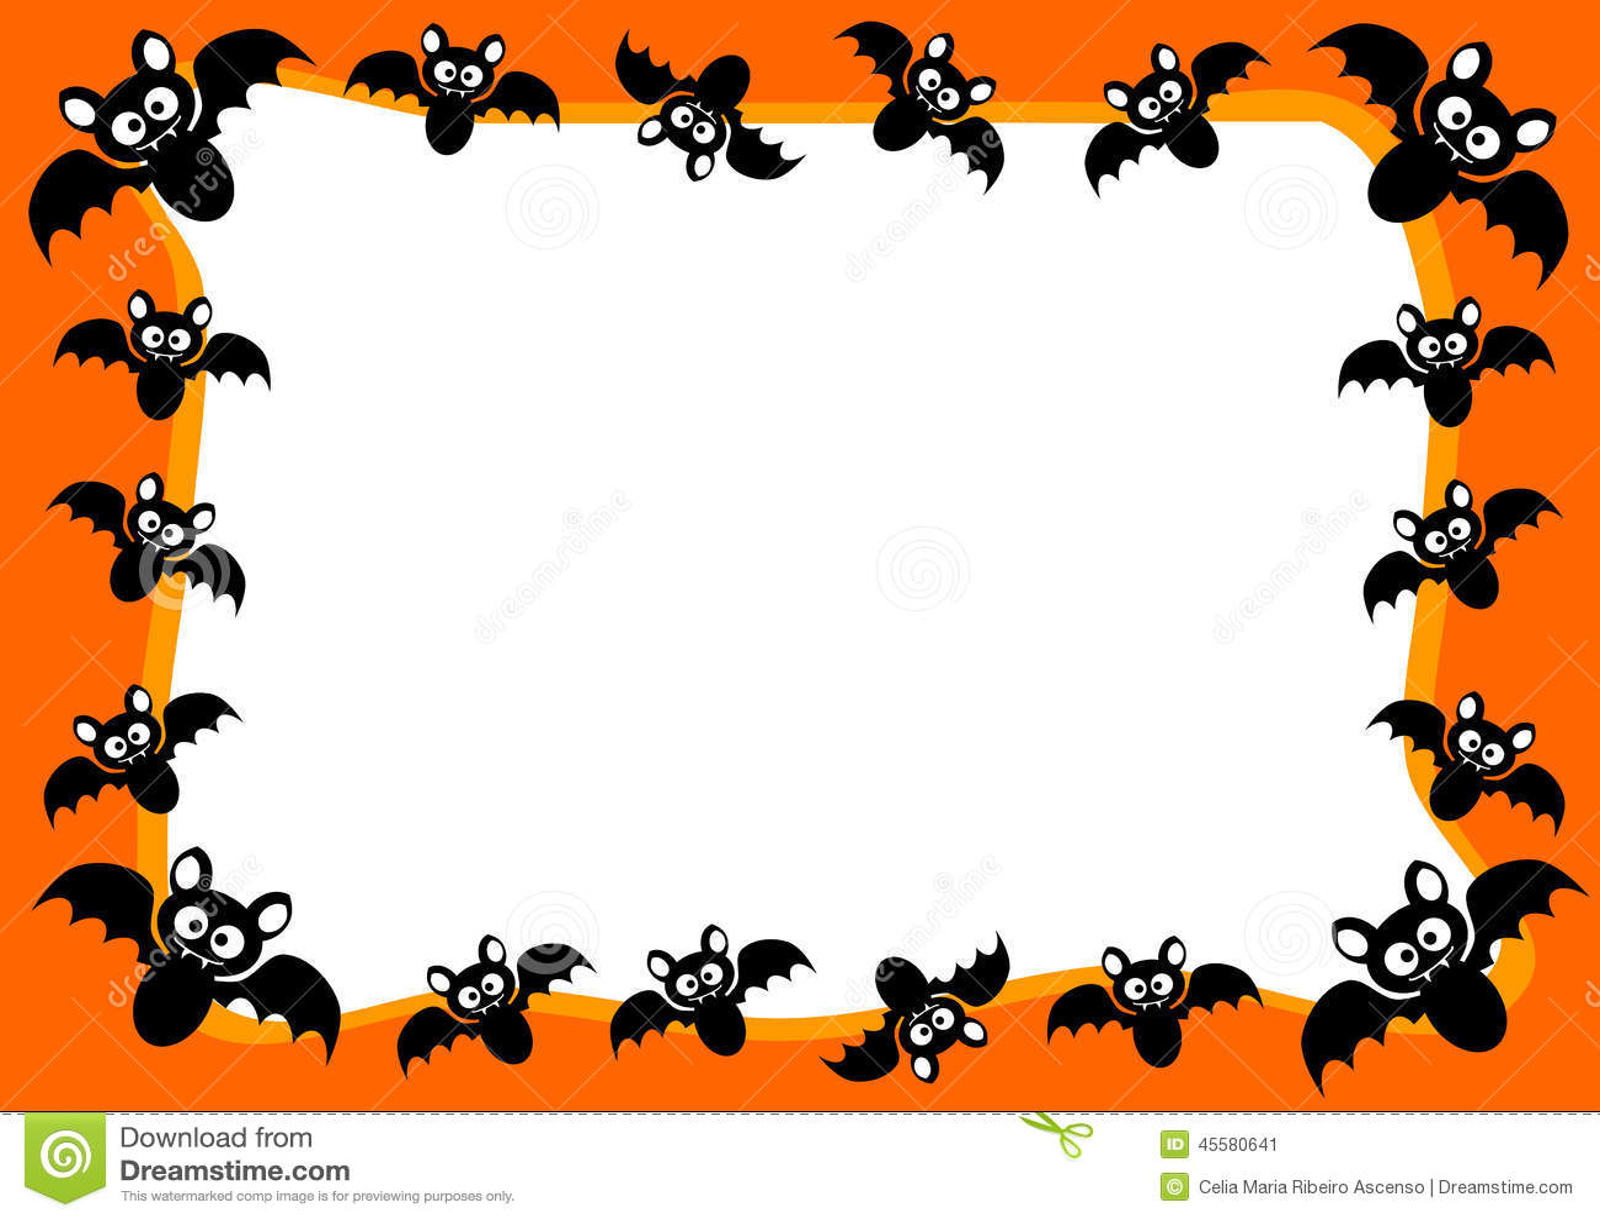 halloween invitation card flying bats frame stock illustration